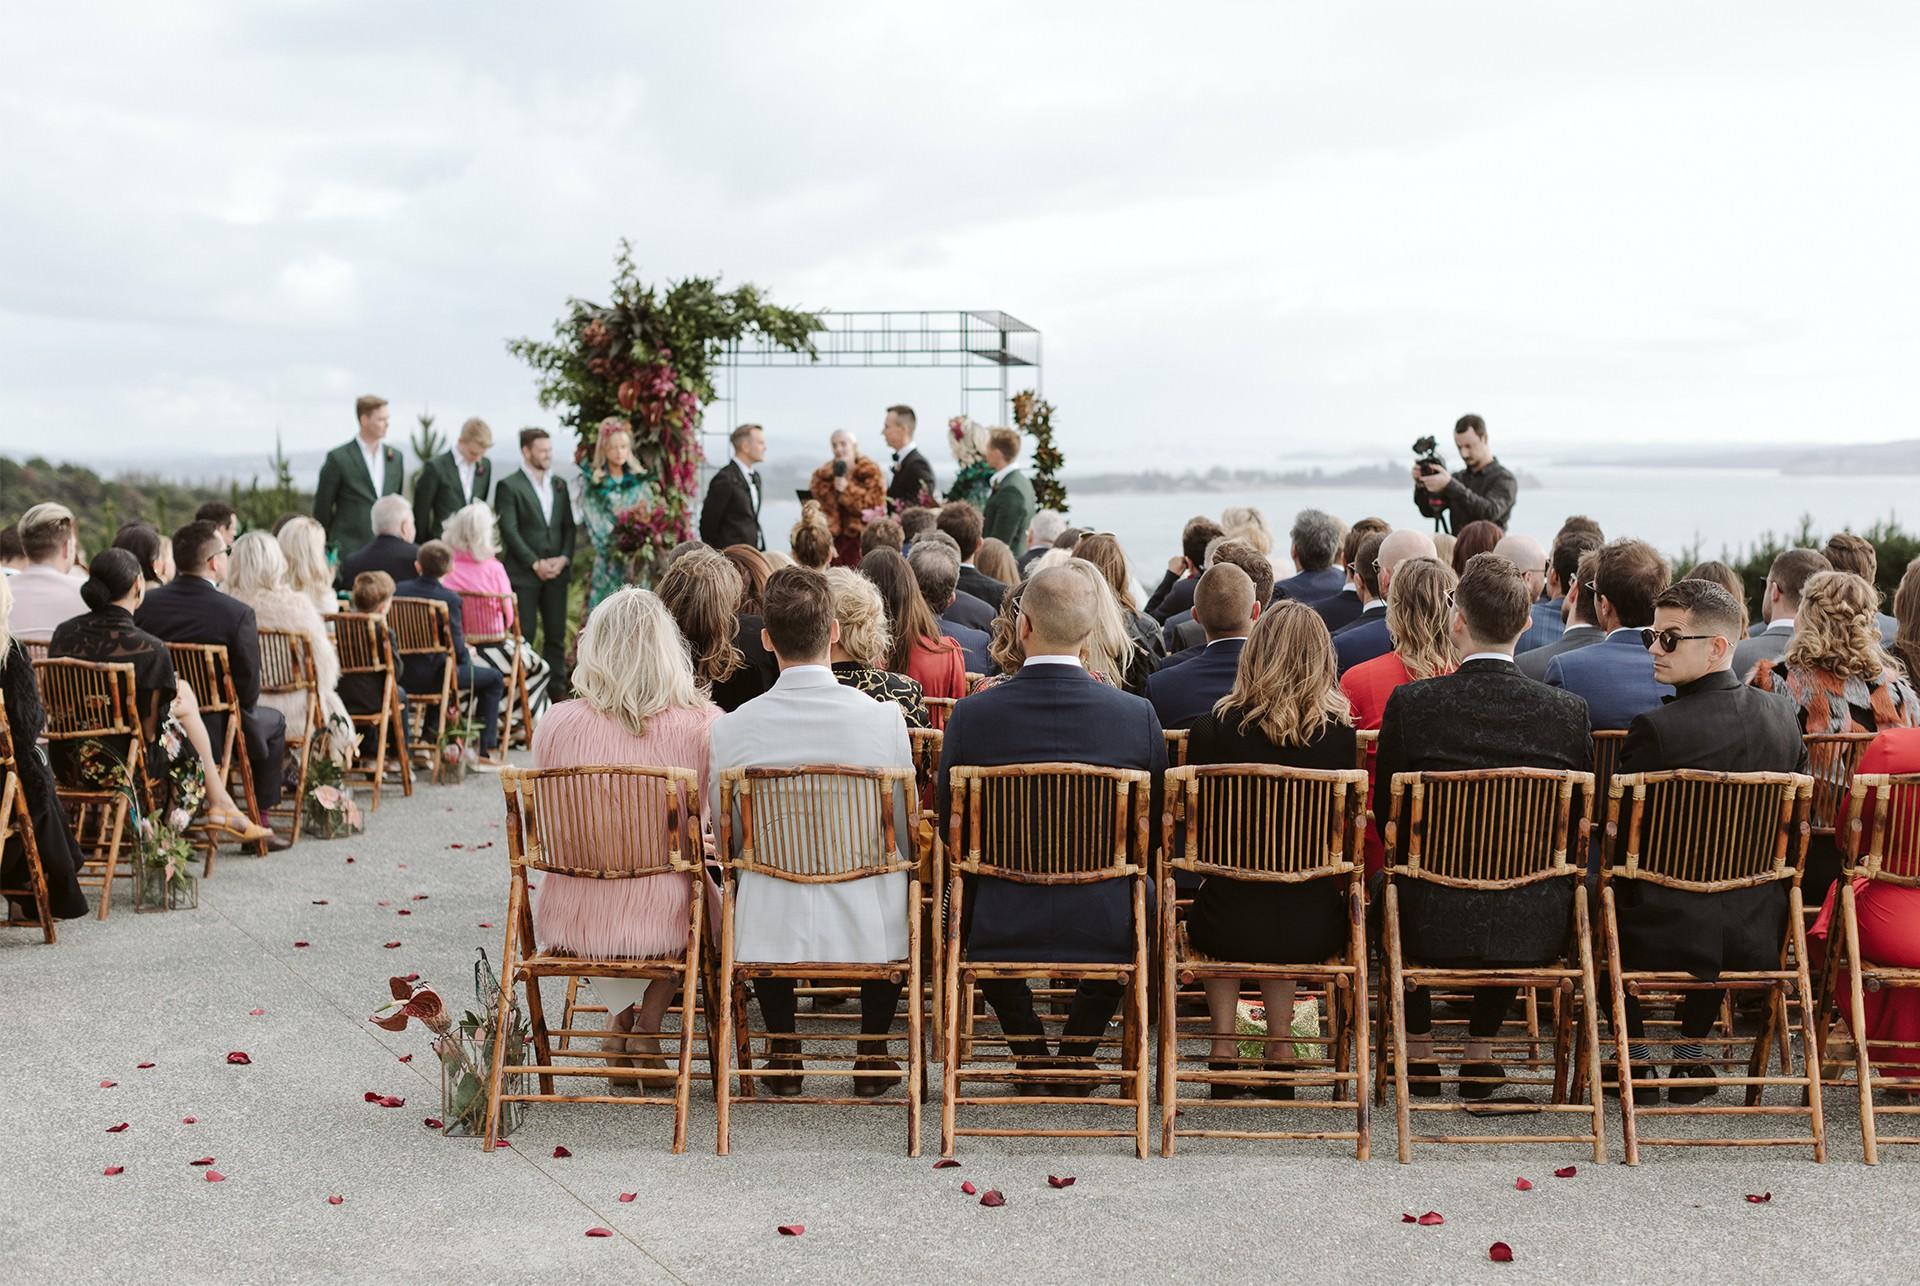 PETE-+-ANTE---Wedding-Floral_0002s_0000_PETE-+-ANTE-3.jpg